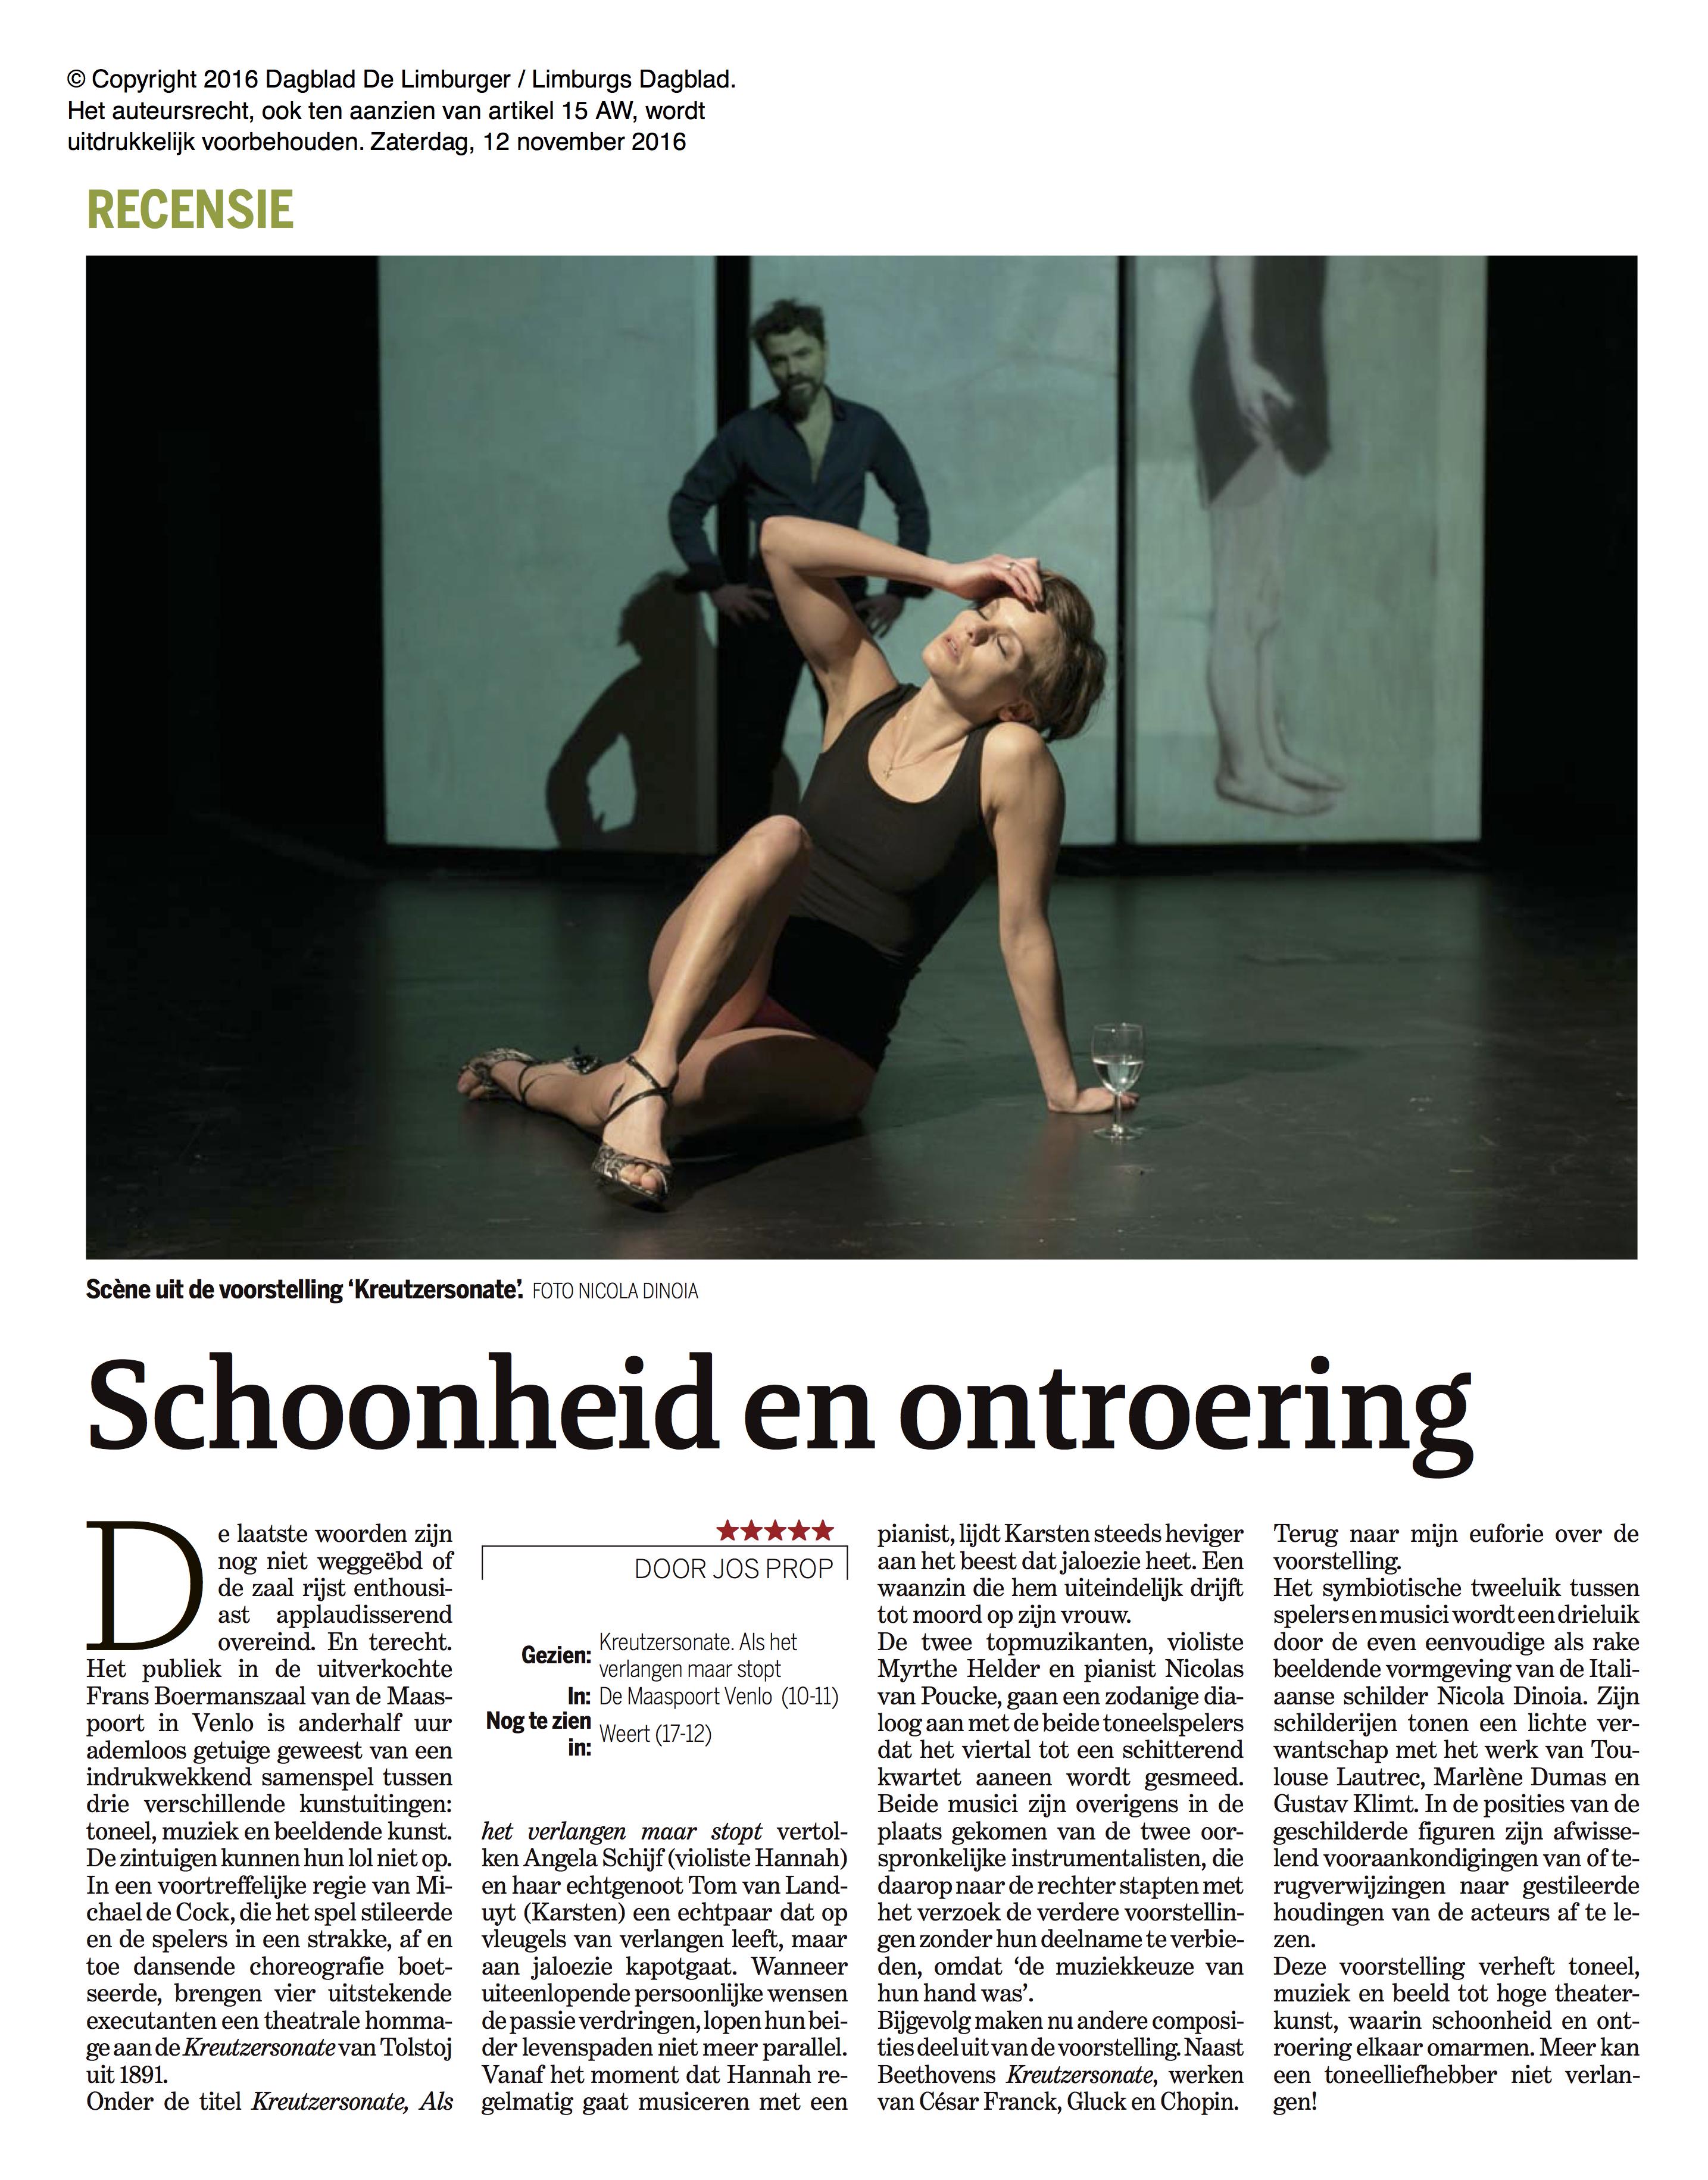 kreutzersonate-dagblad-de-limburger-recensie-12-11-2016